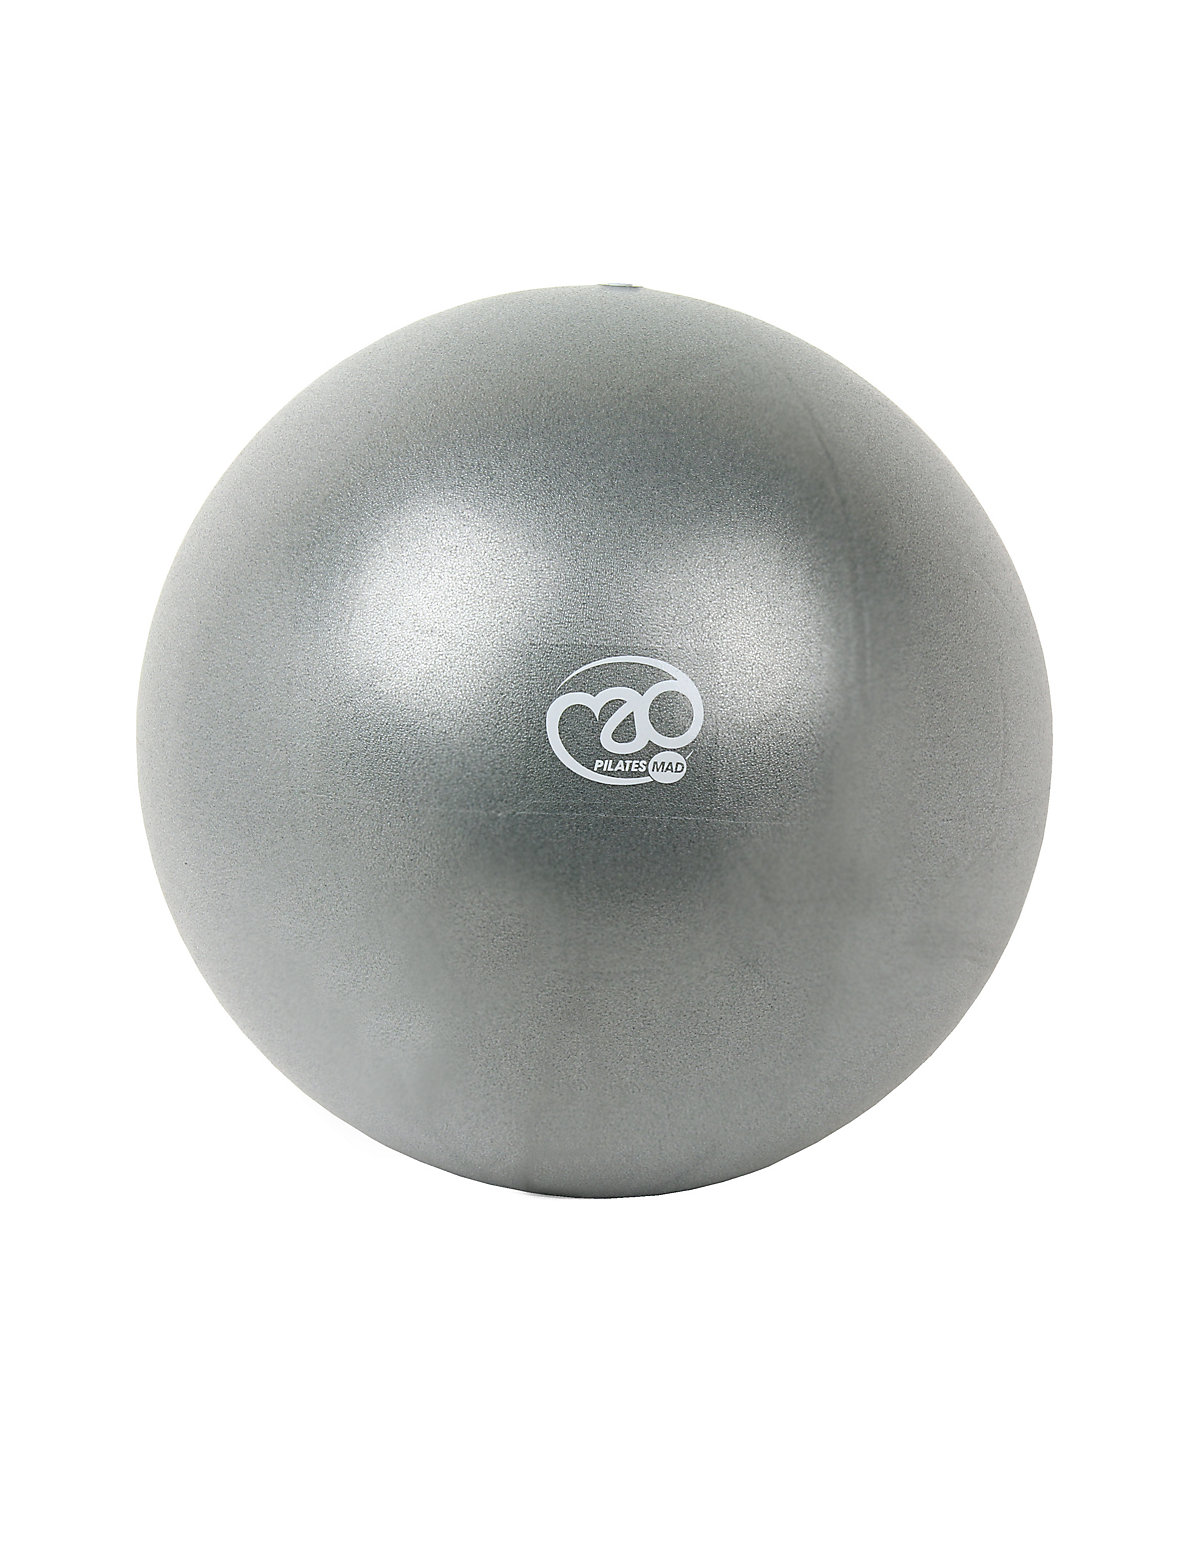 Yoga-Mad 12 Inch Soft Pilates Ball